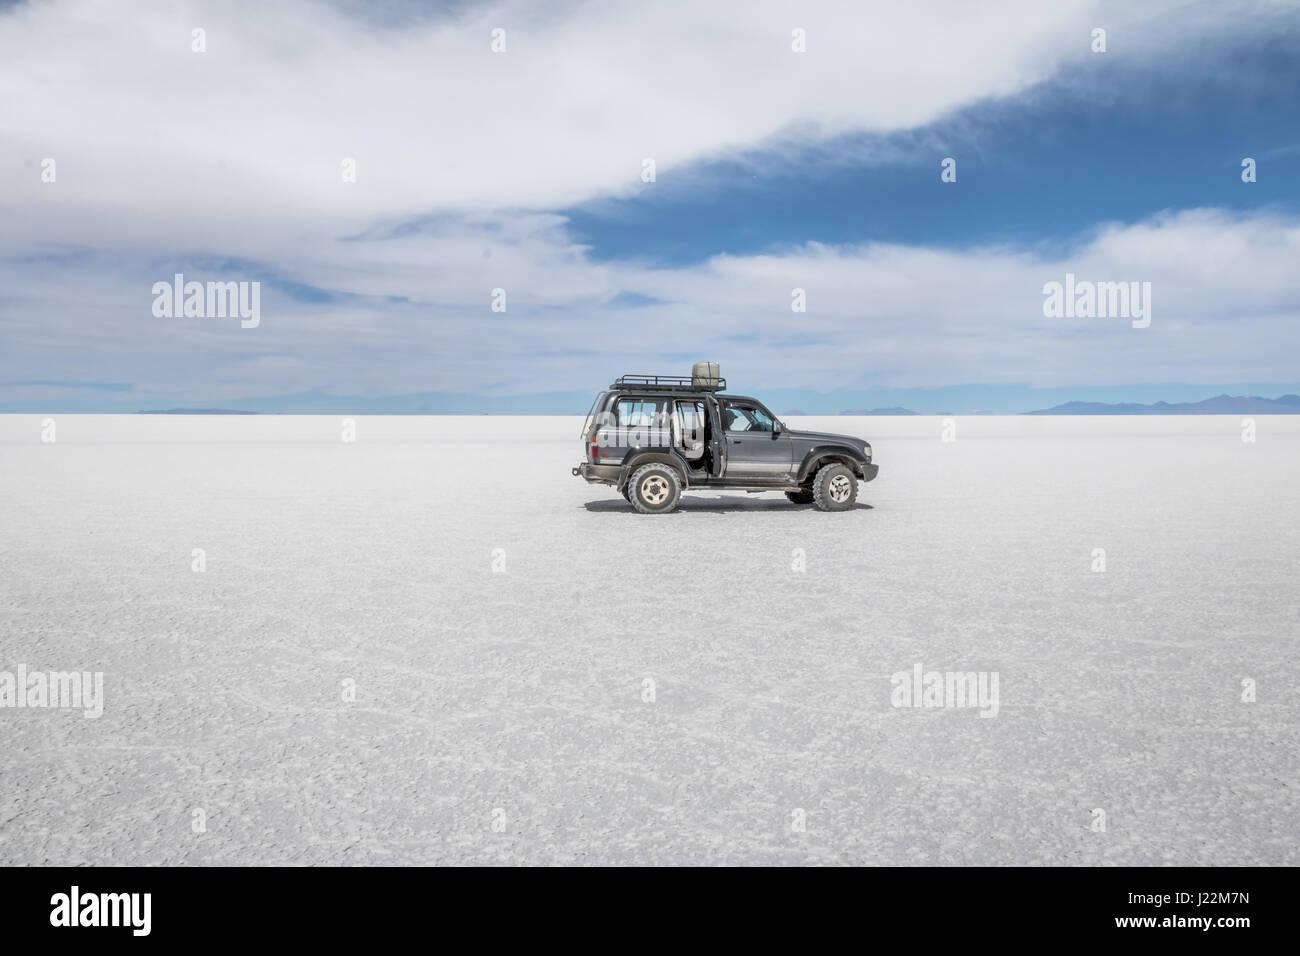 Off-road vehicle in Salar de Uyuni salt flat - Potosi Department, Bolivia - Stock Image